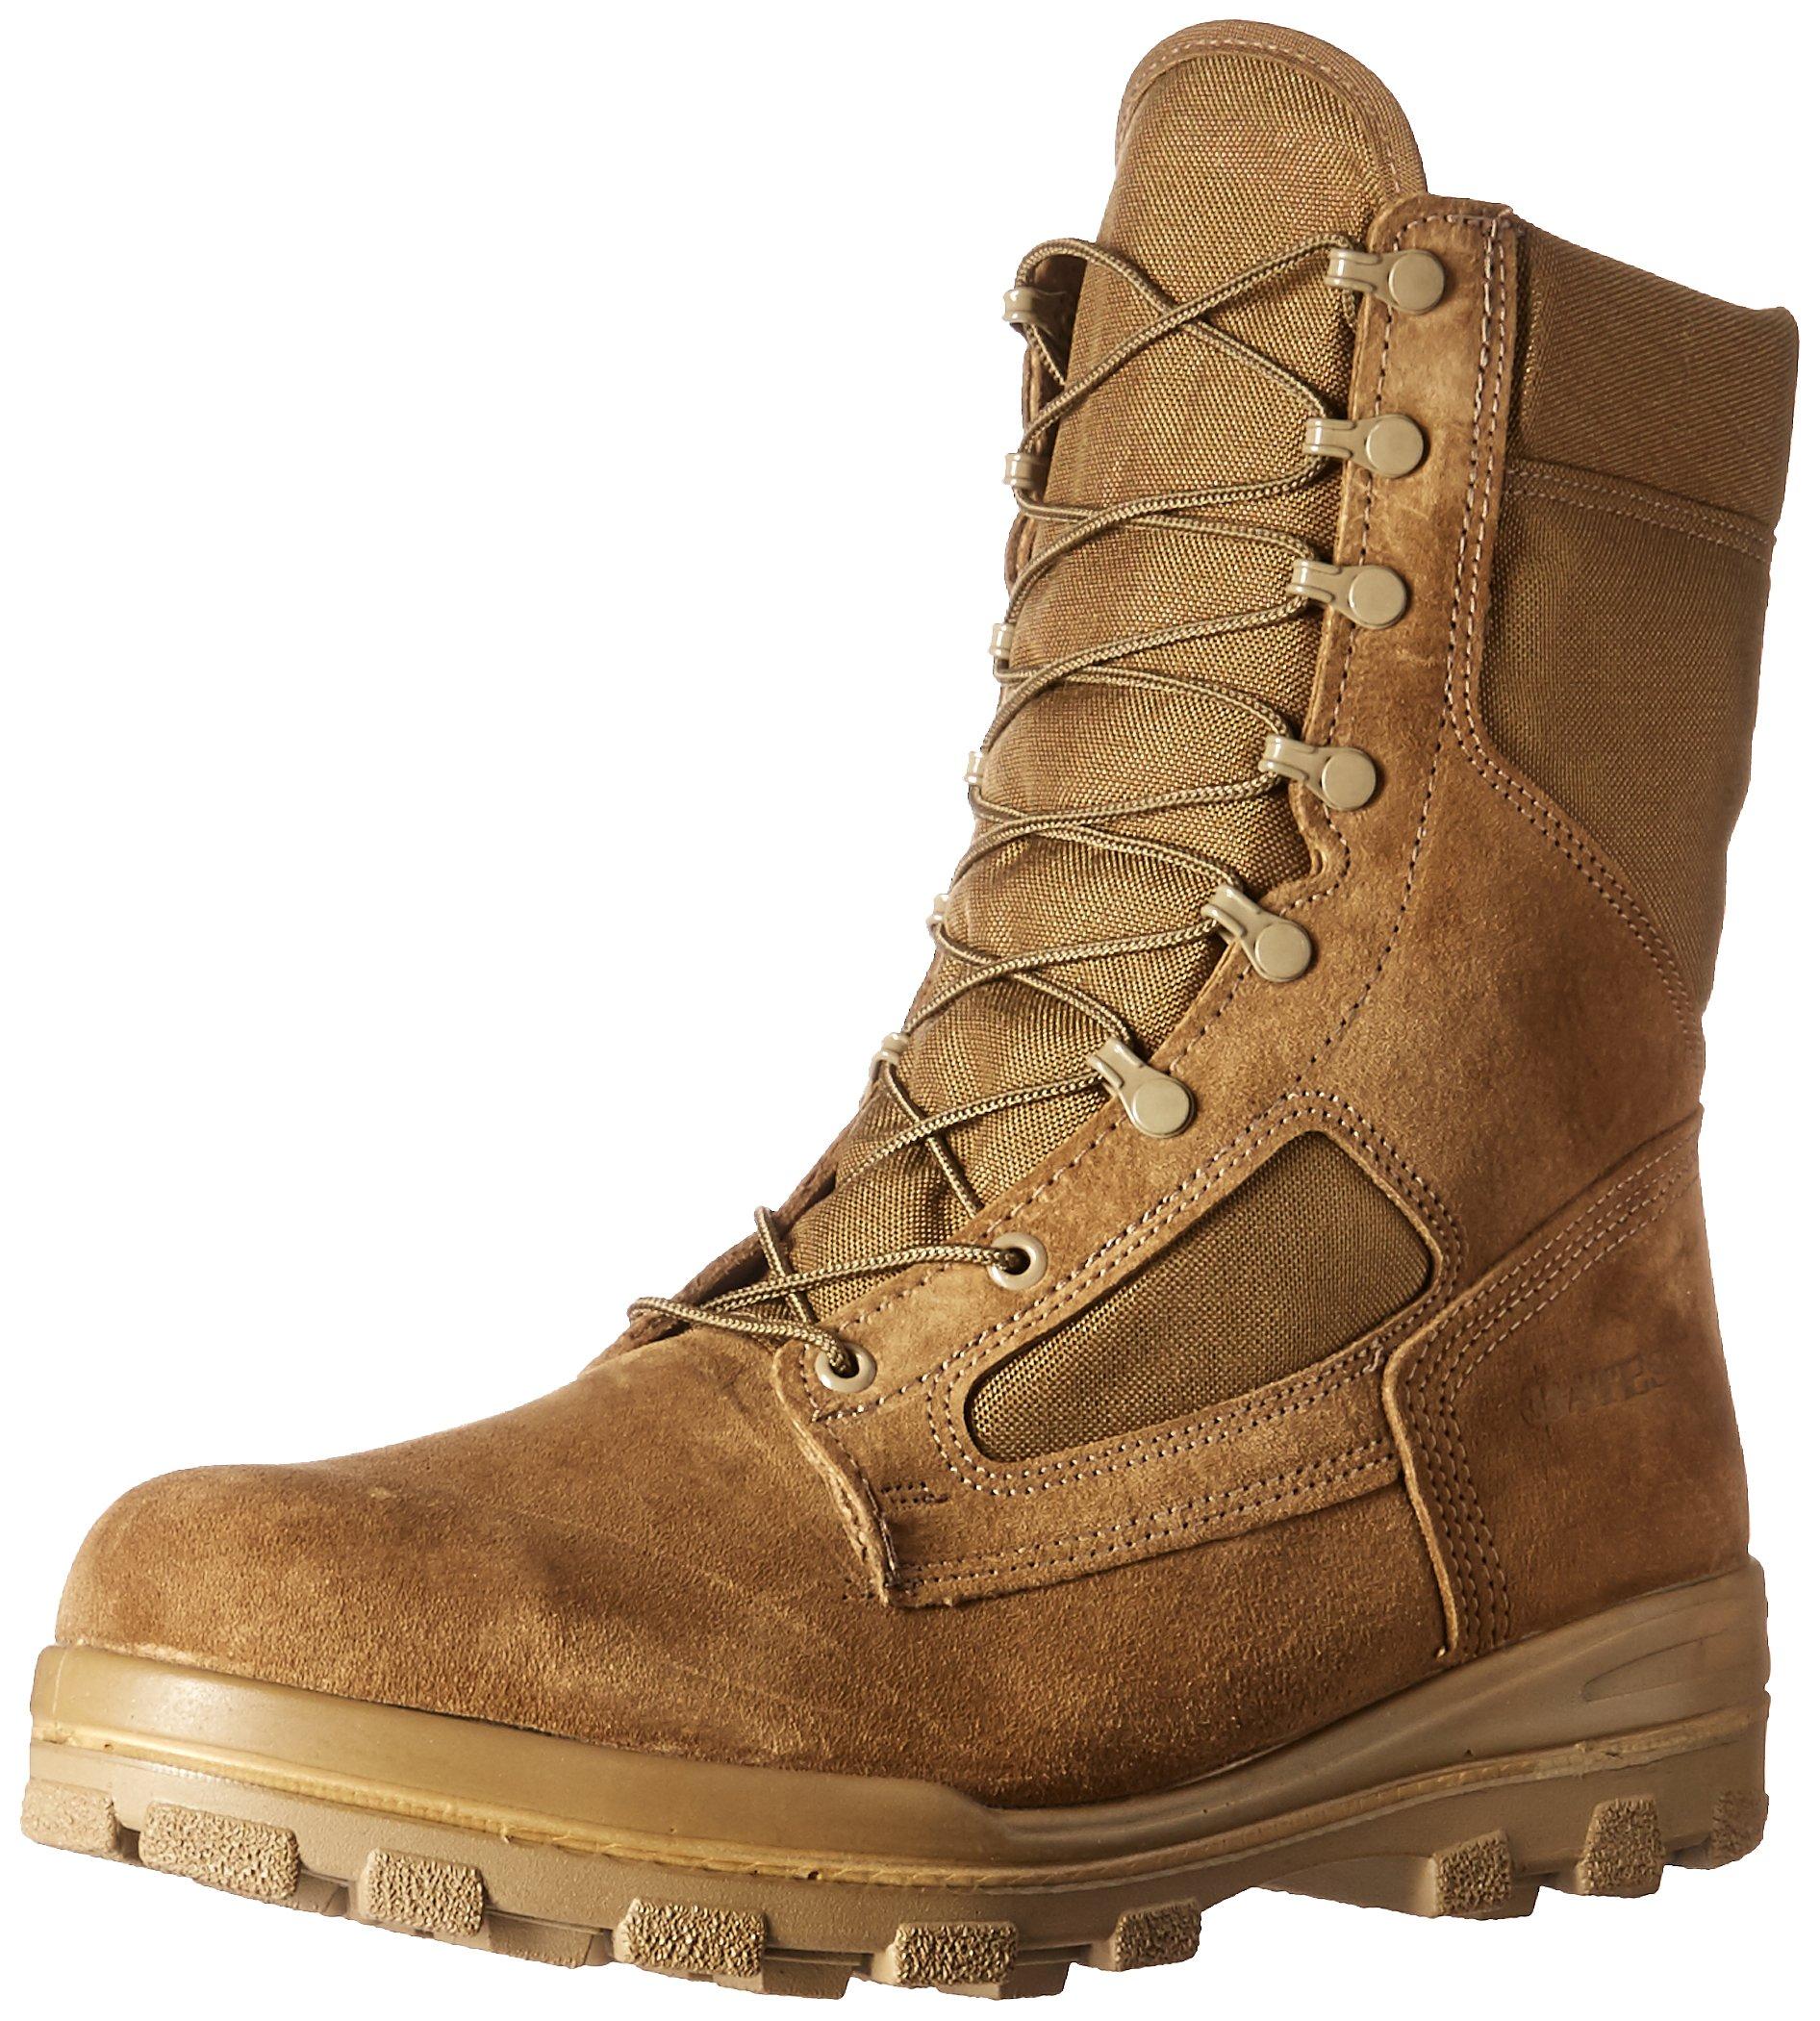 Bates Men's Durashocks Steel Toe Military & Tactical Boot, Olive Mojave, 14 M US by Bates